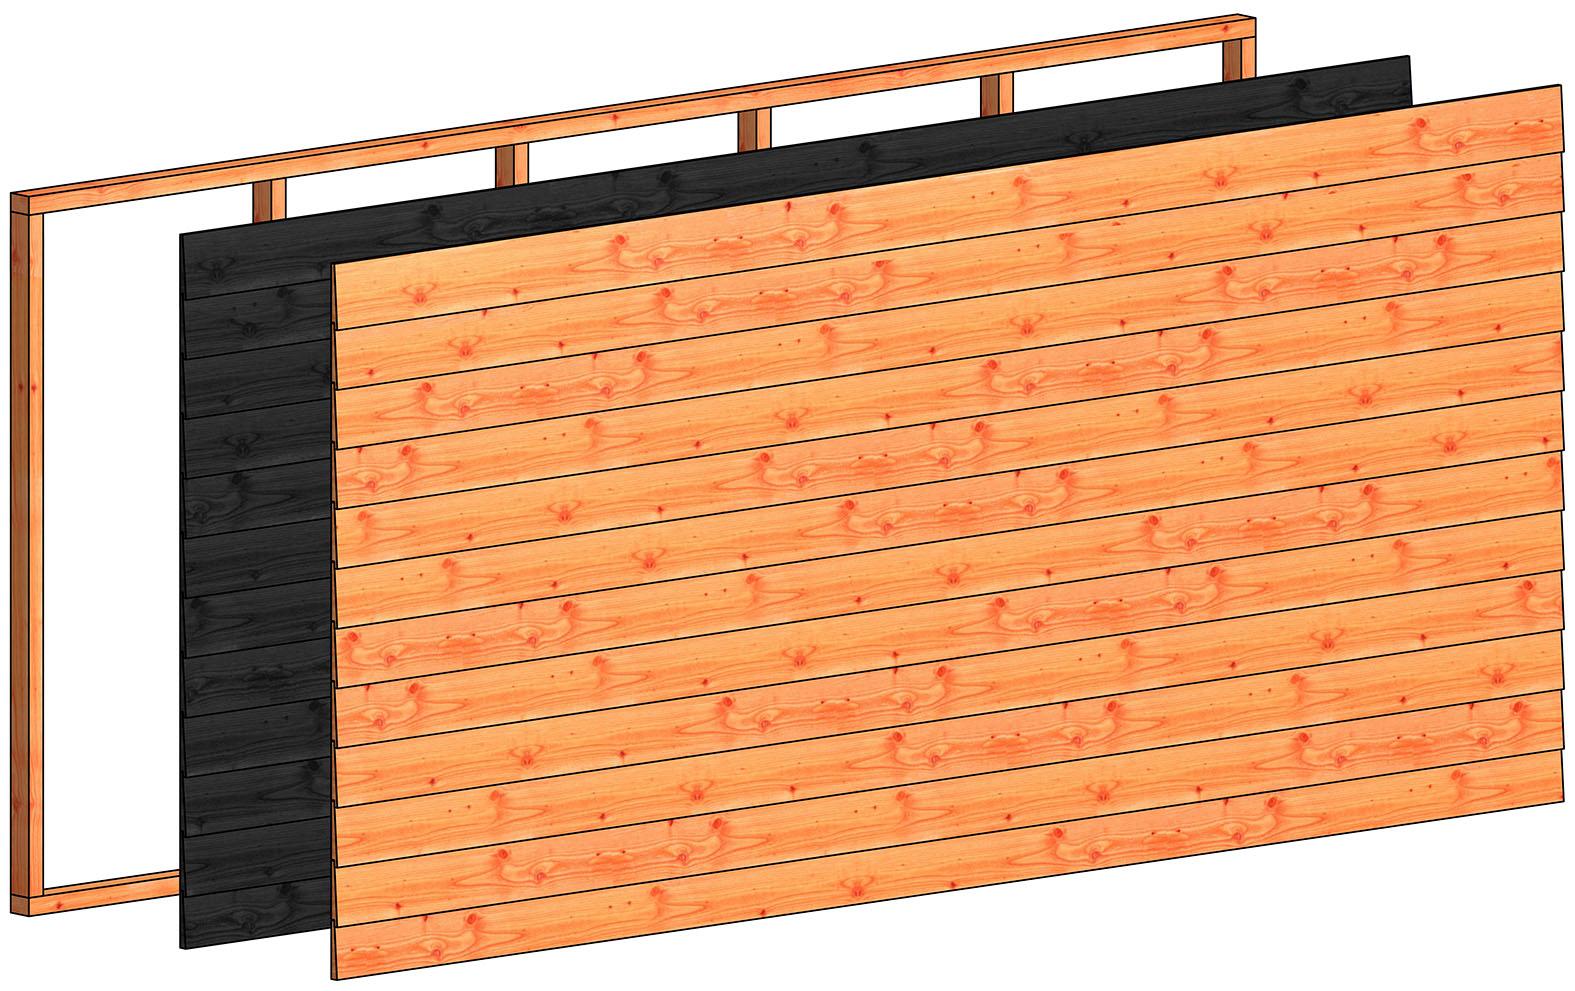 Trendhout | Wandmodule L potdekselplanken zwart | 340.5x156 cm